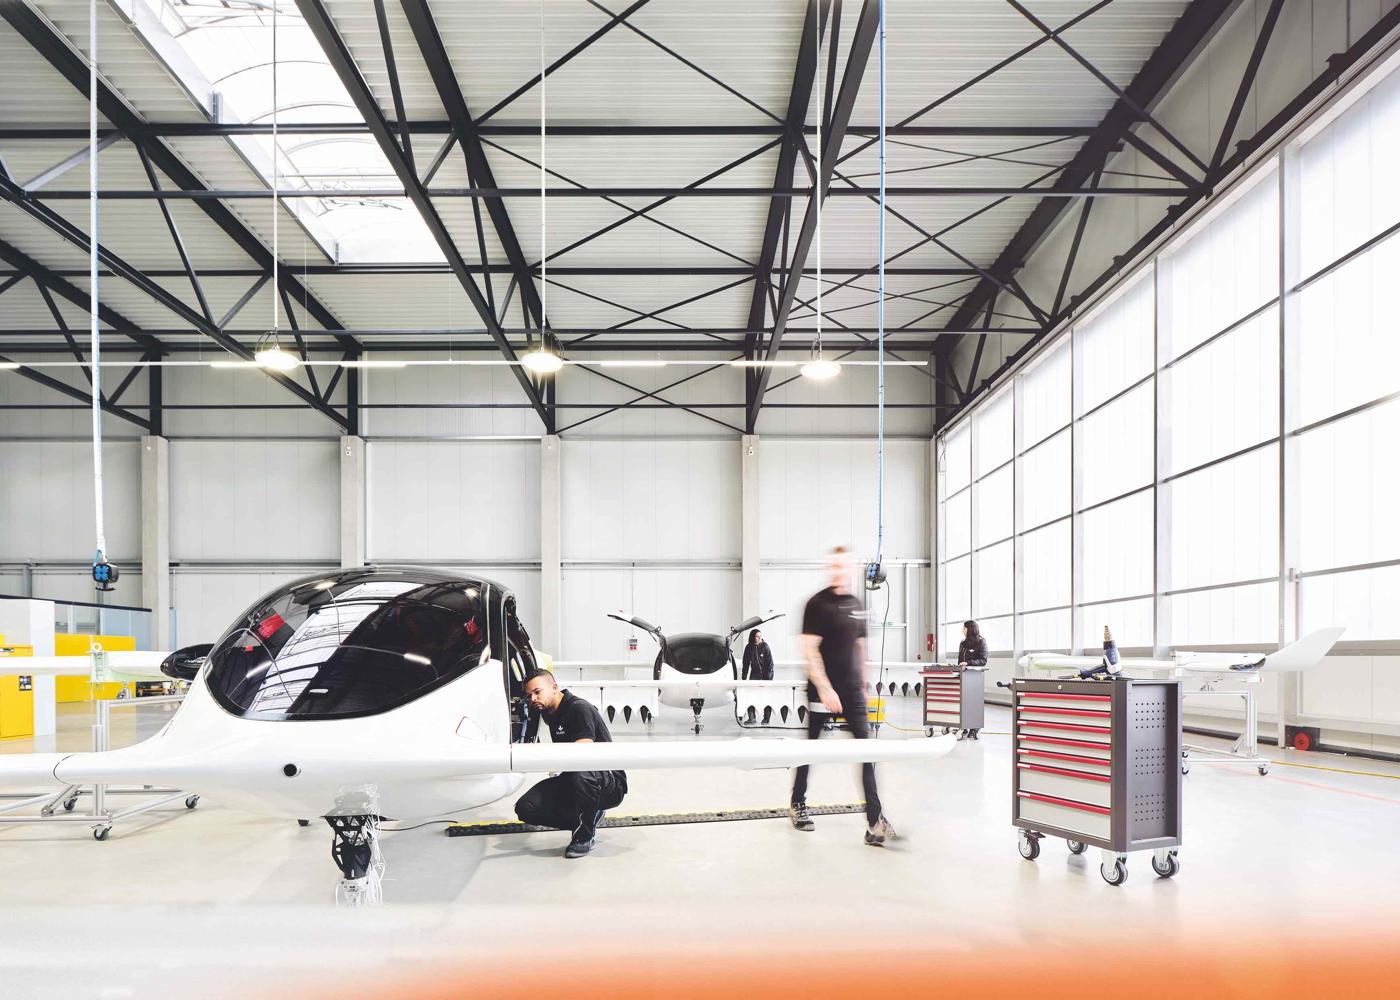 Lilium Jet prototypes